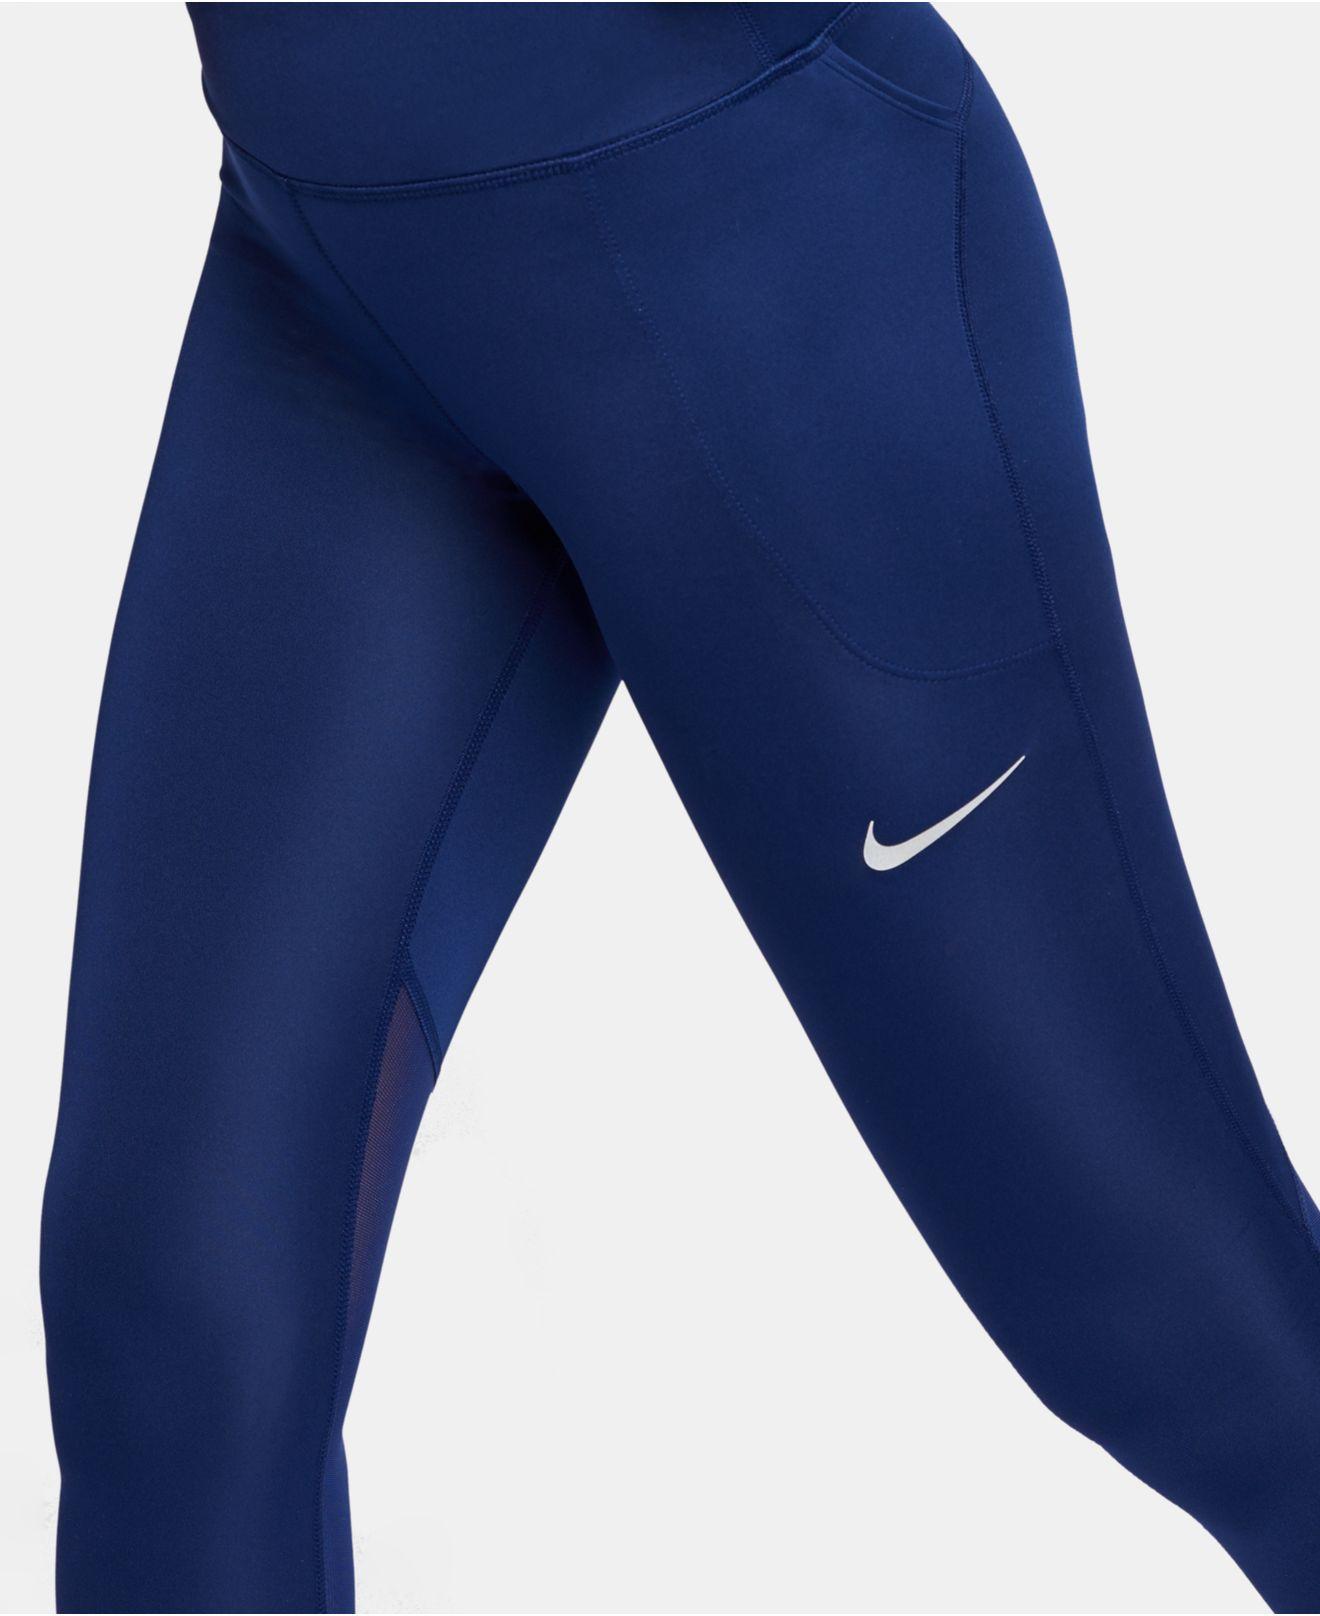 94f3ac68c64854 Nike - Blue Fast Capri Leggings - Lyst. View fullscreen